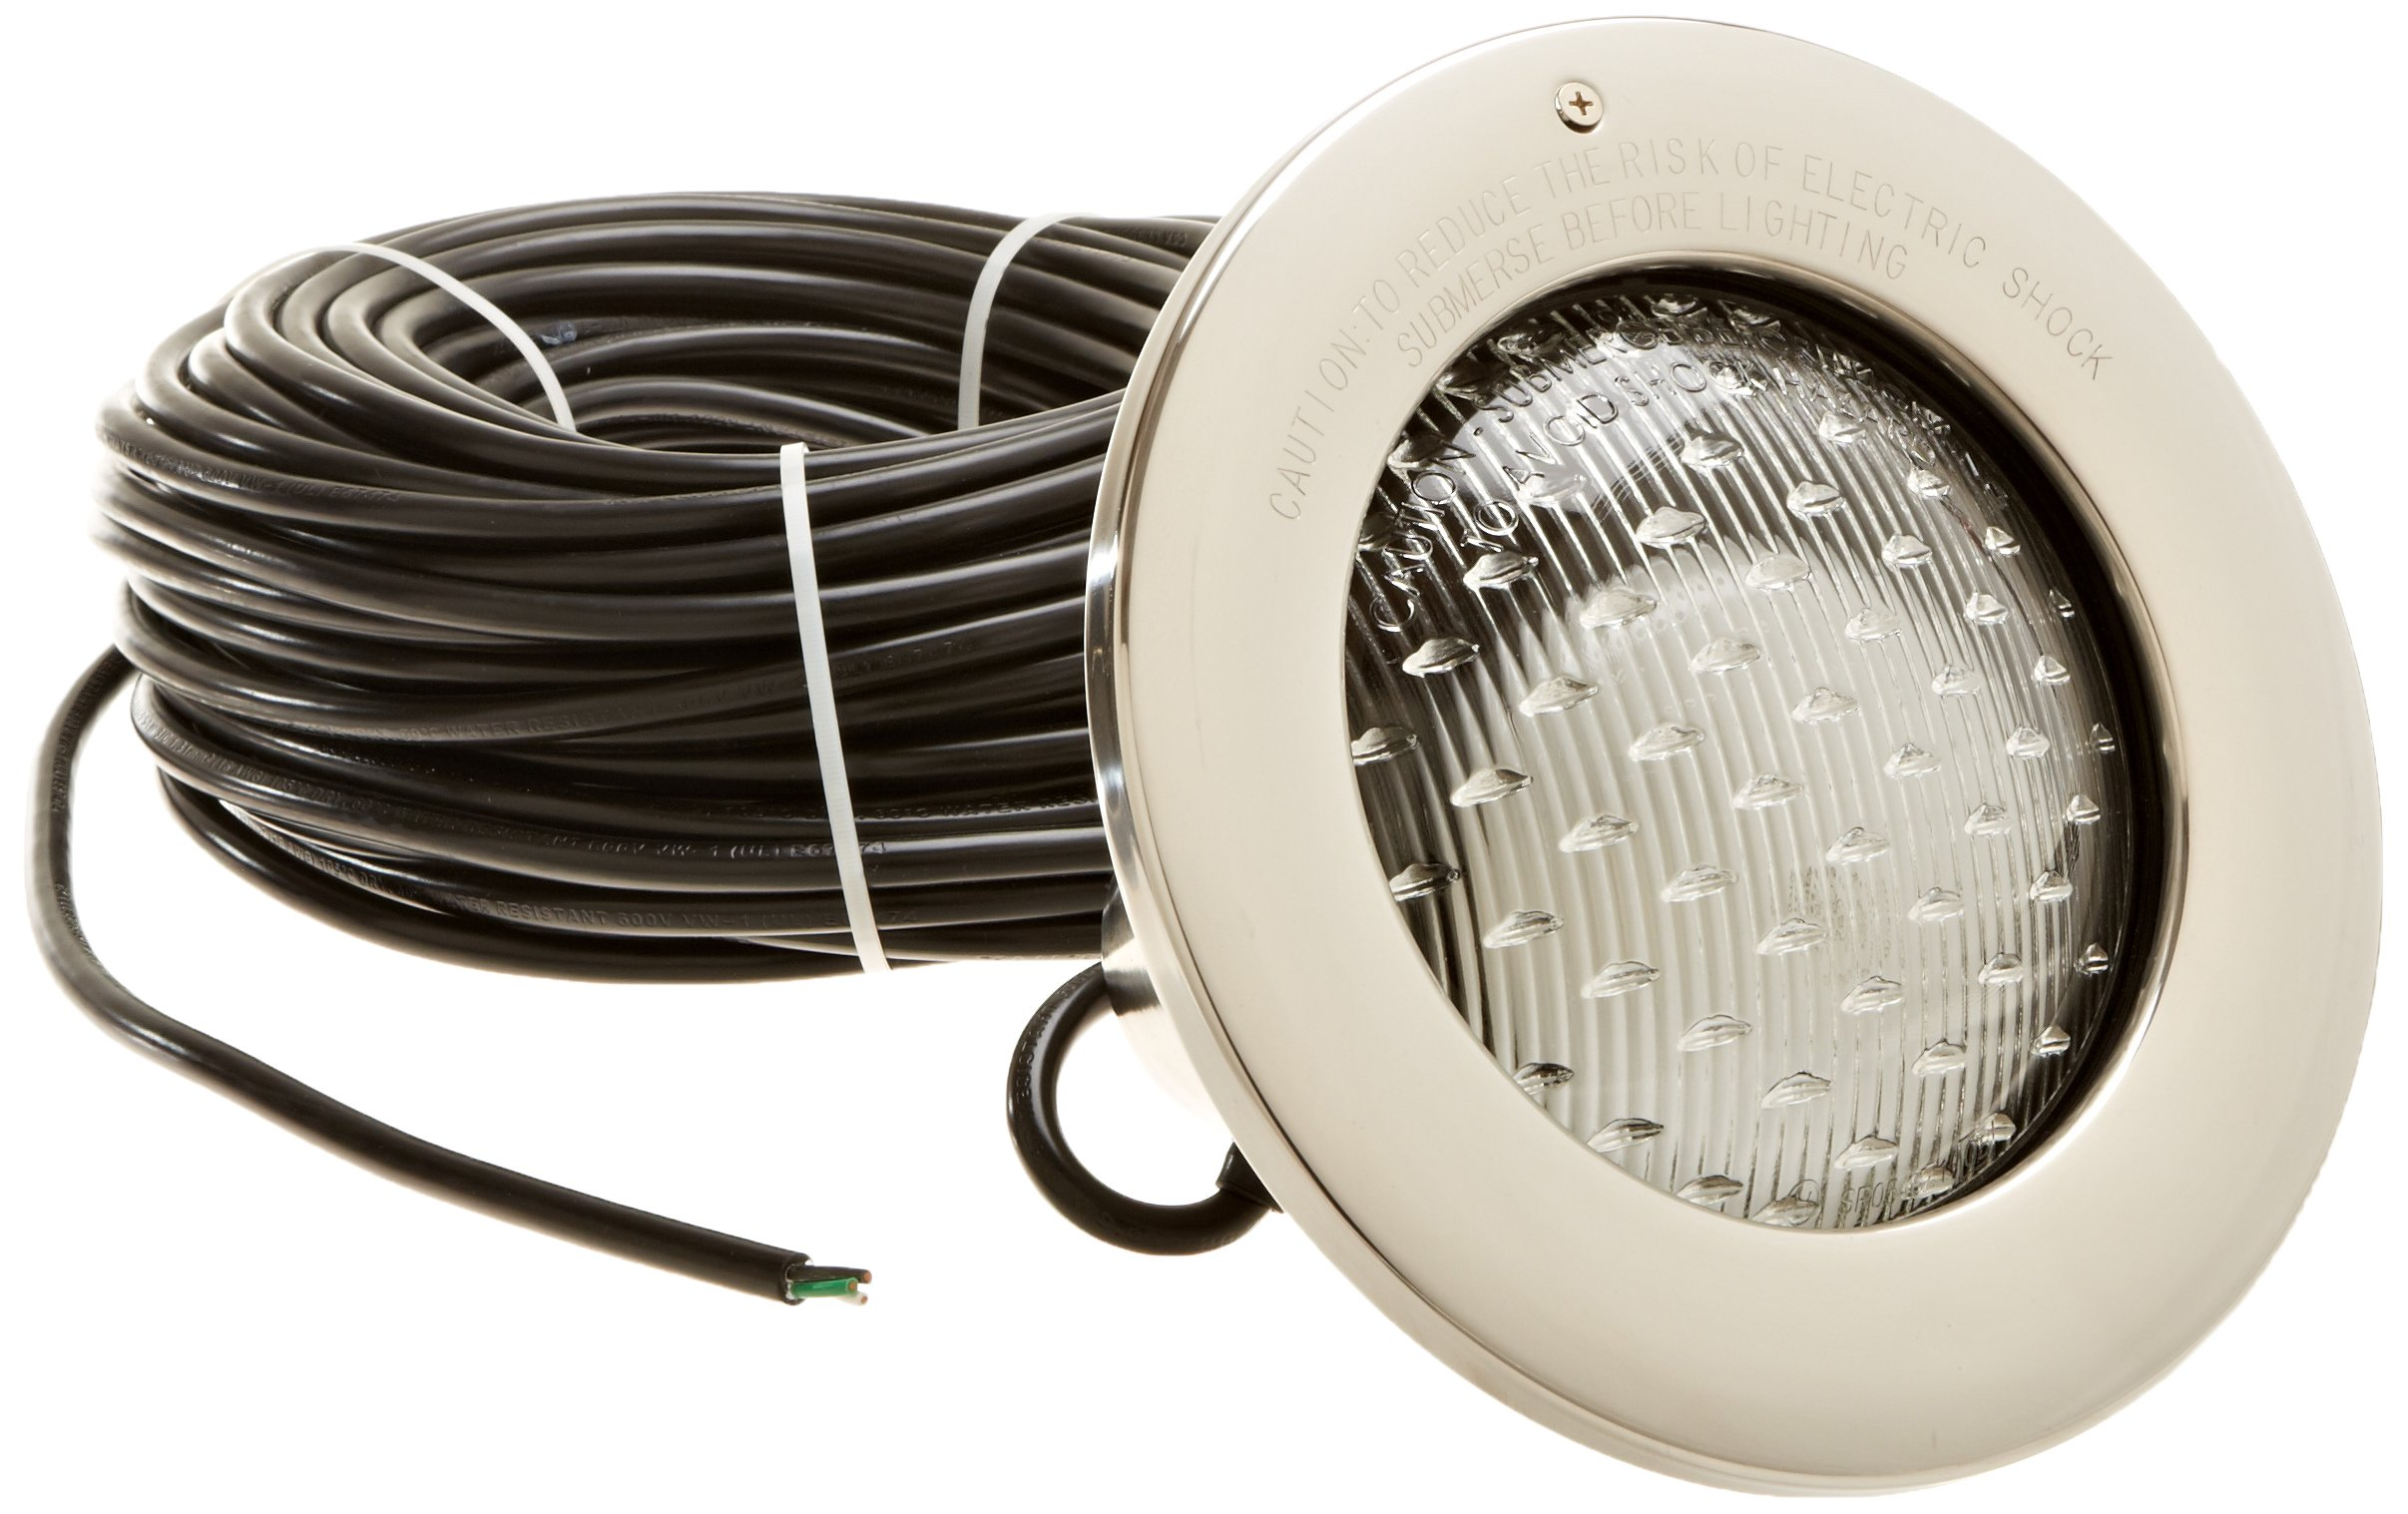 HAYWARD POOL PRODUCTS SP0582SL150 300-watt Incandescent Pool Lights, 120-volt by Hayward